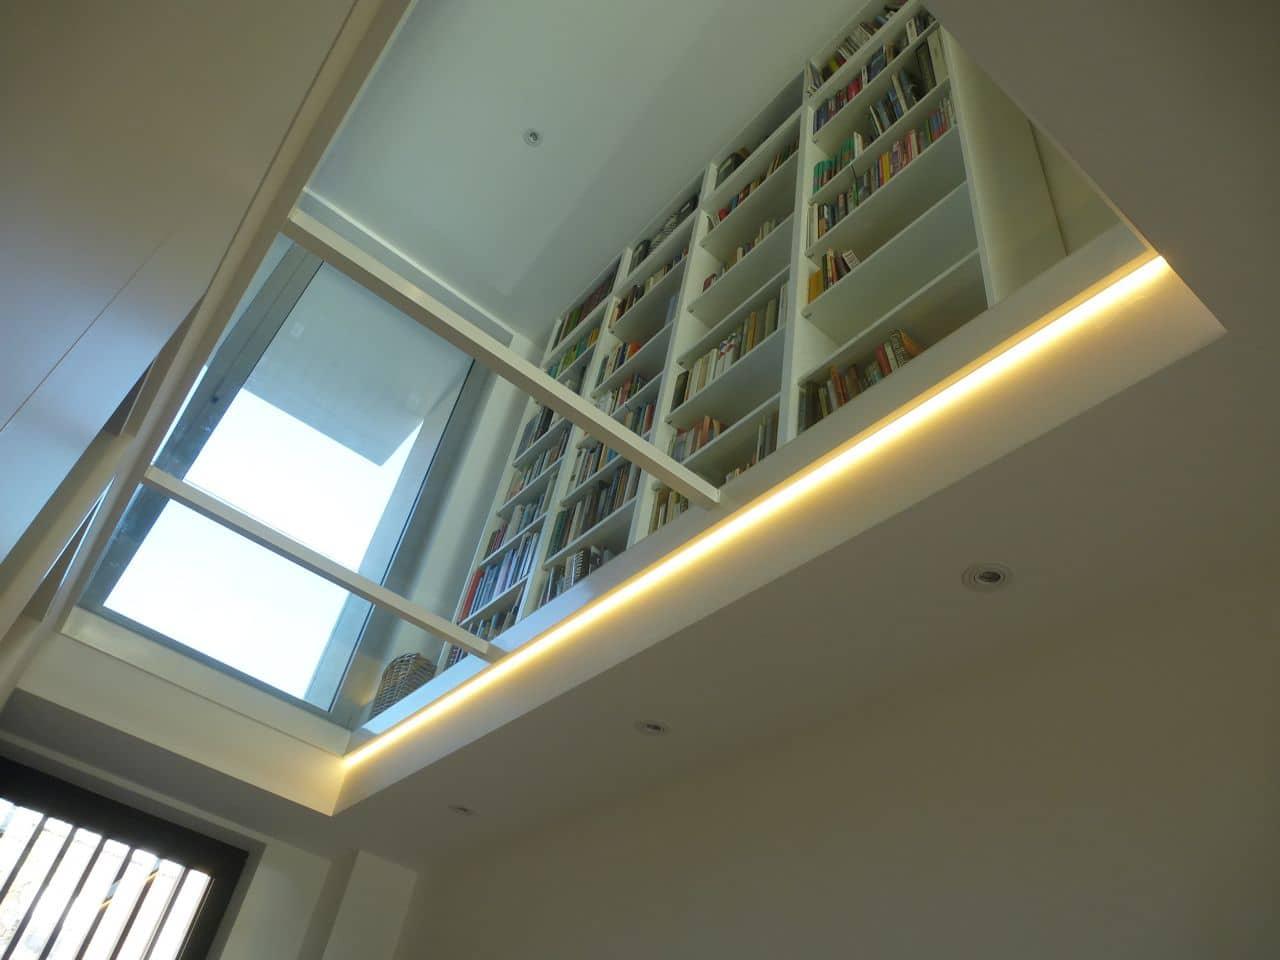 P1080605 | Baeyens & Beck architecten Gent | architect nieuwbouw renovatie interieur | high end | architectenbureau